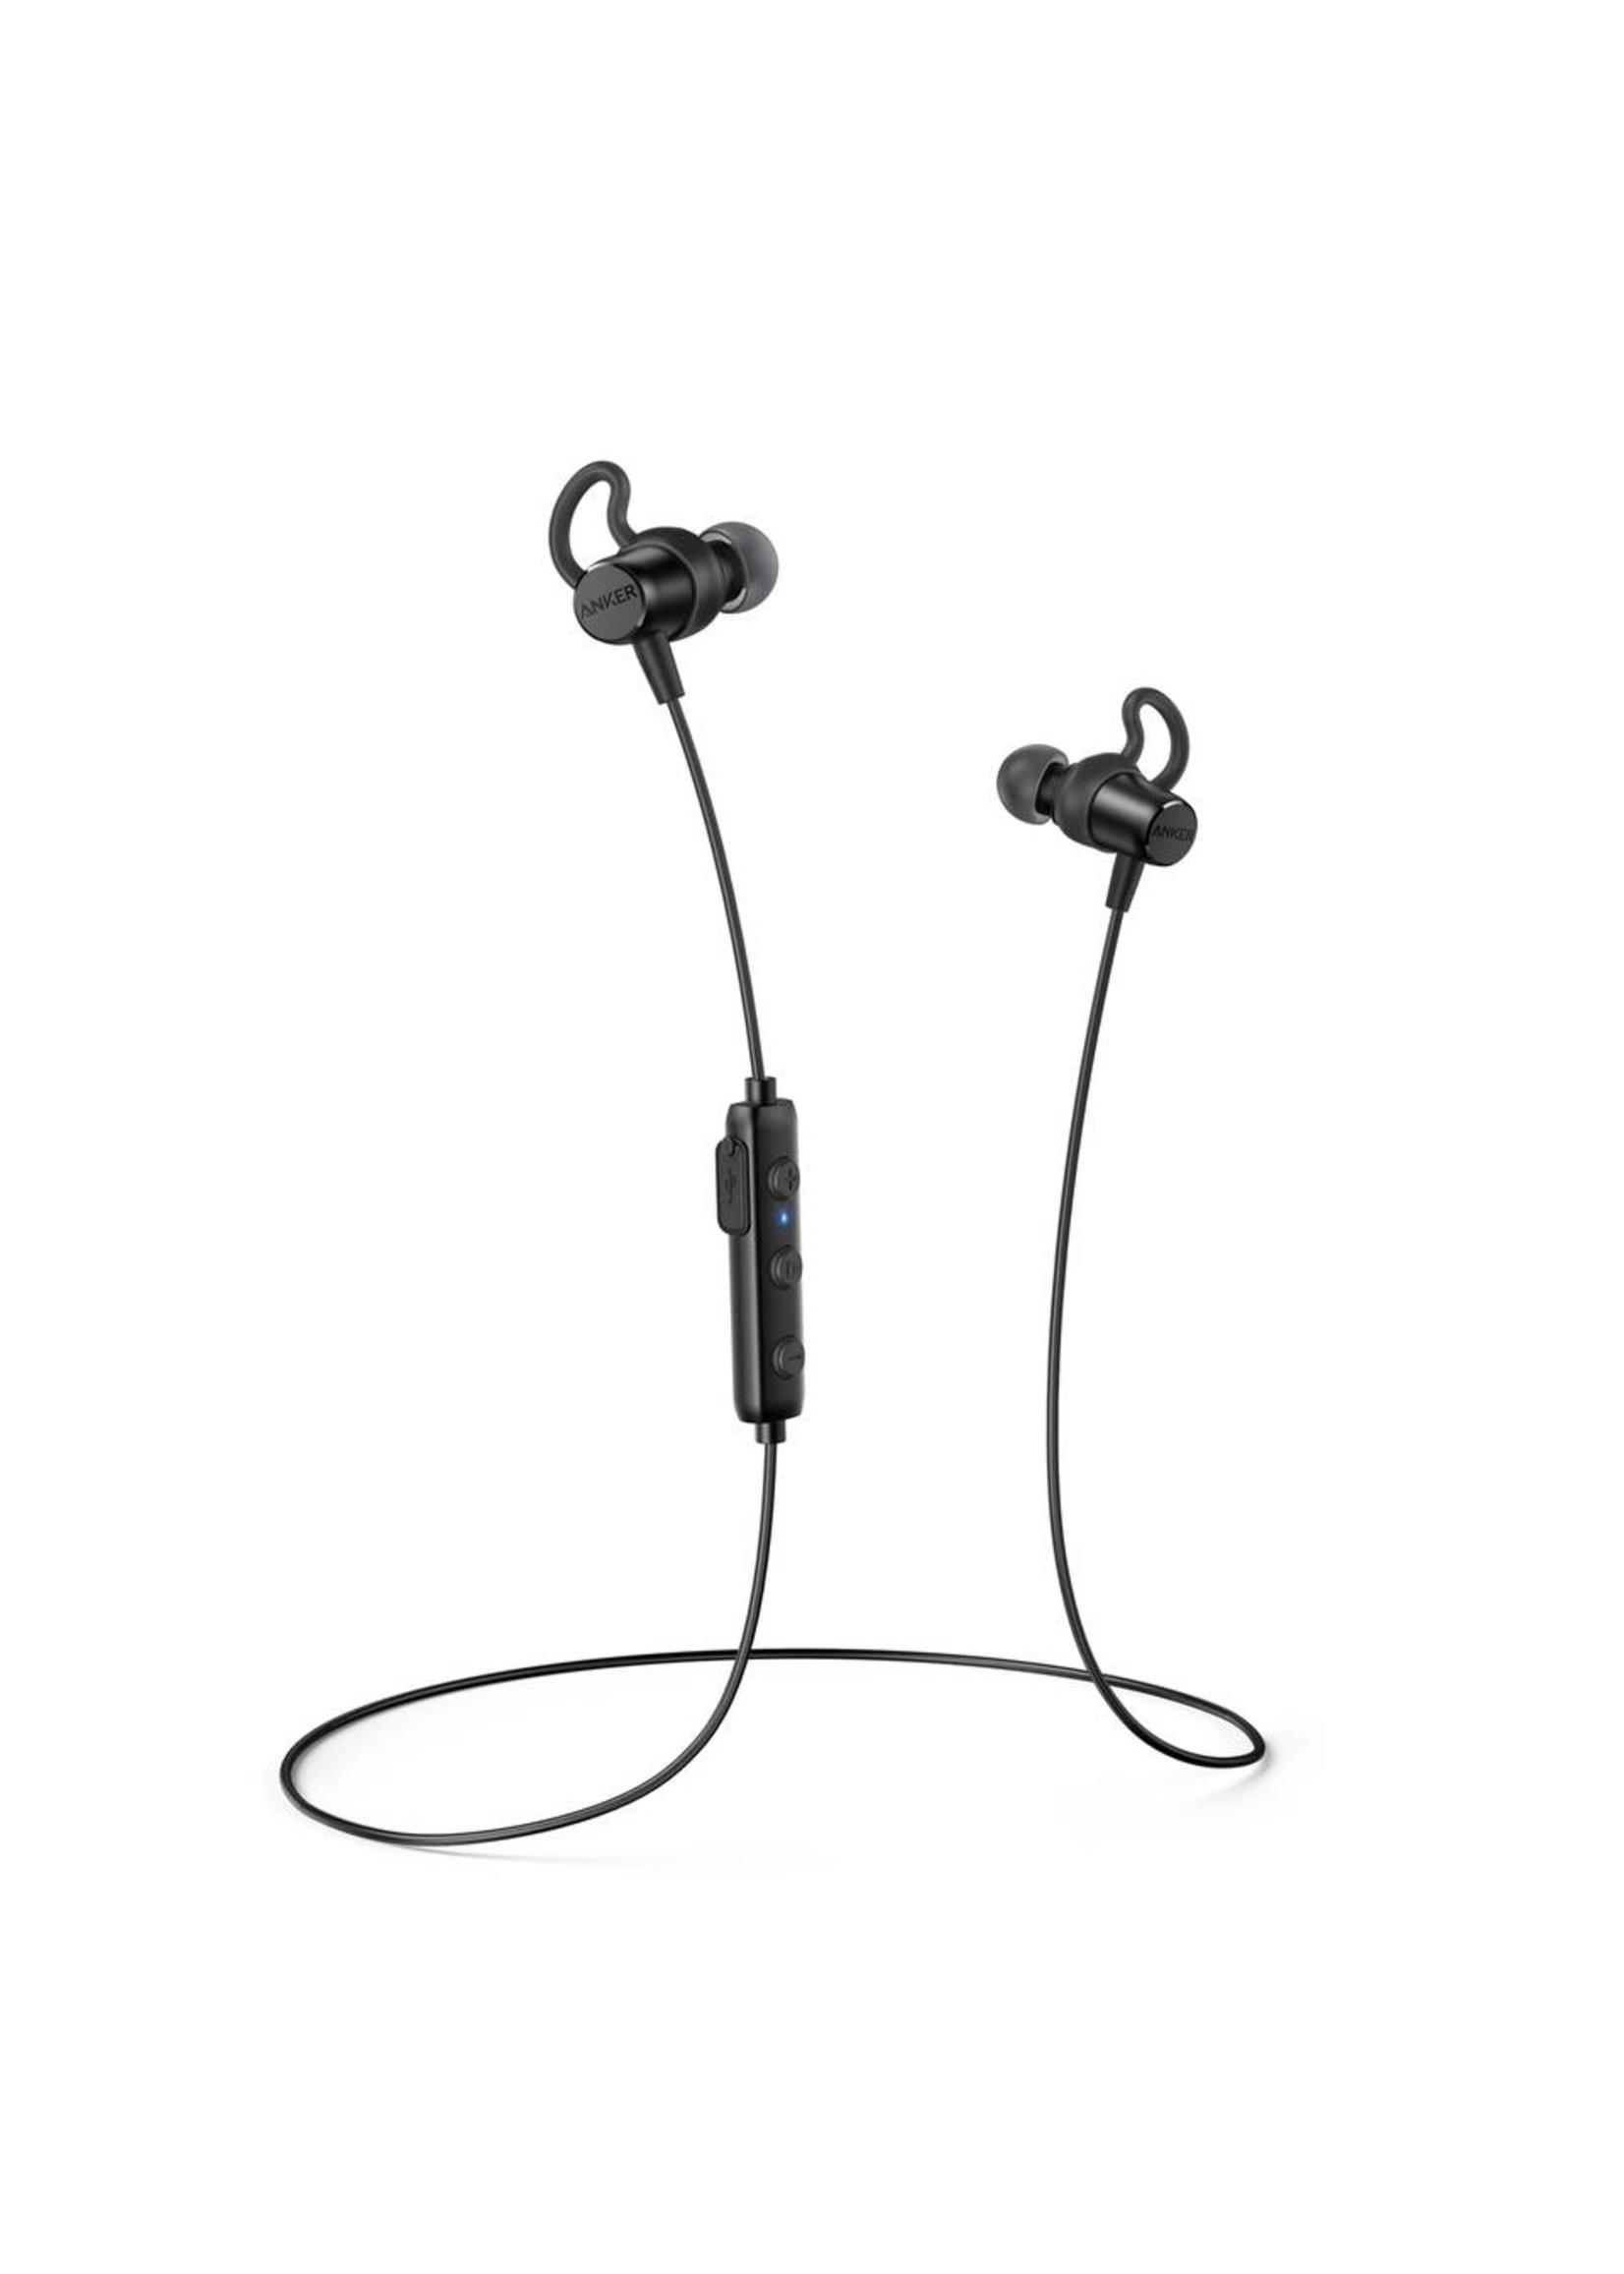 Anker Spirit X Wireless Bluetooth Earphones